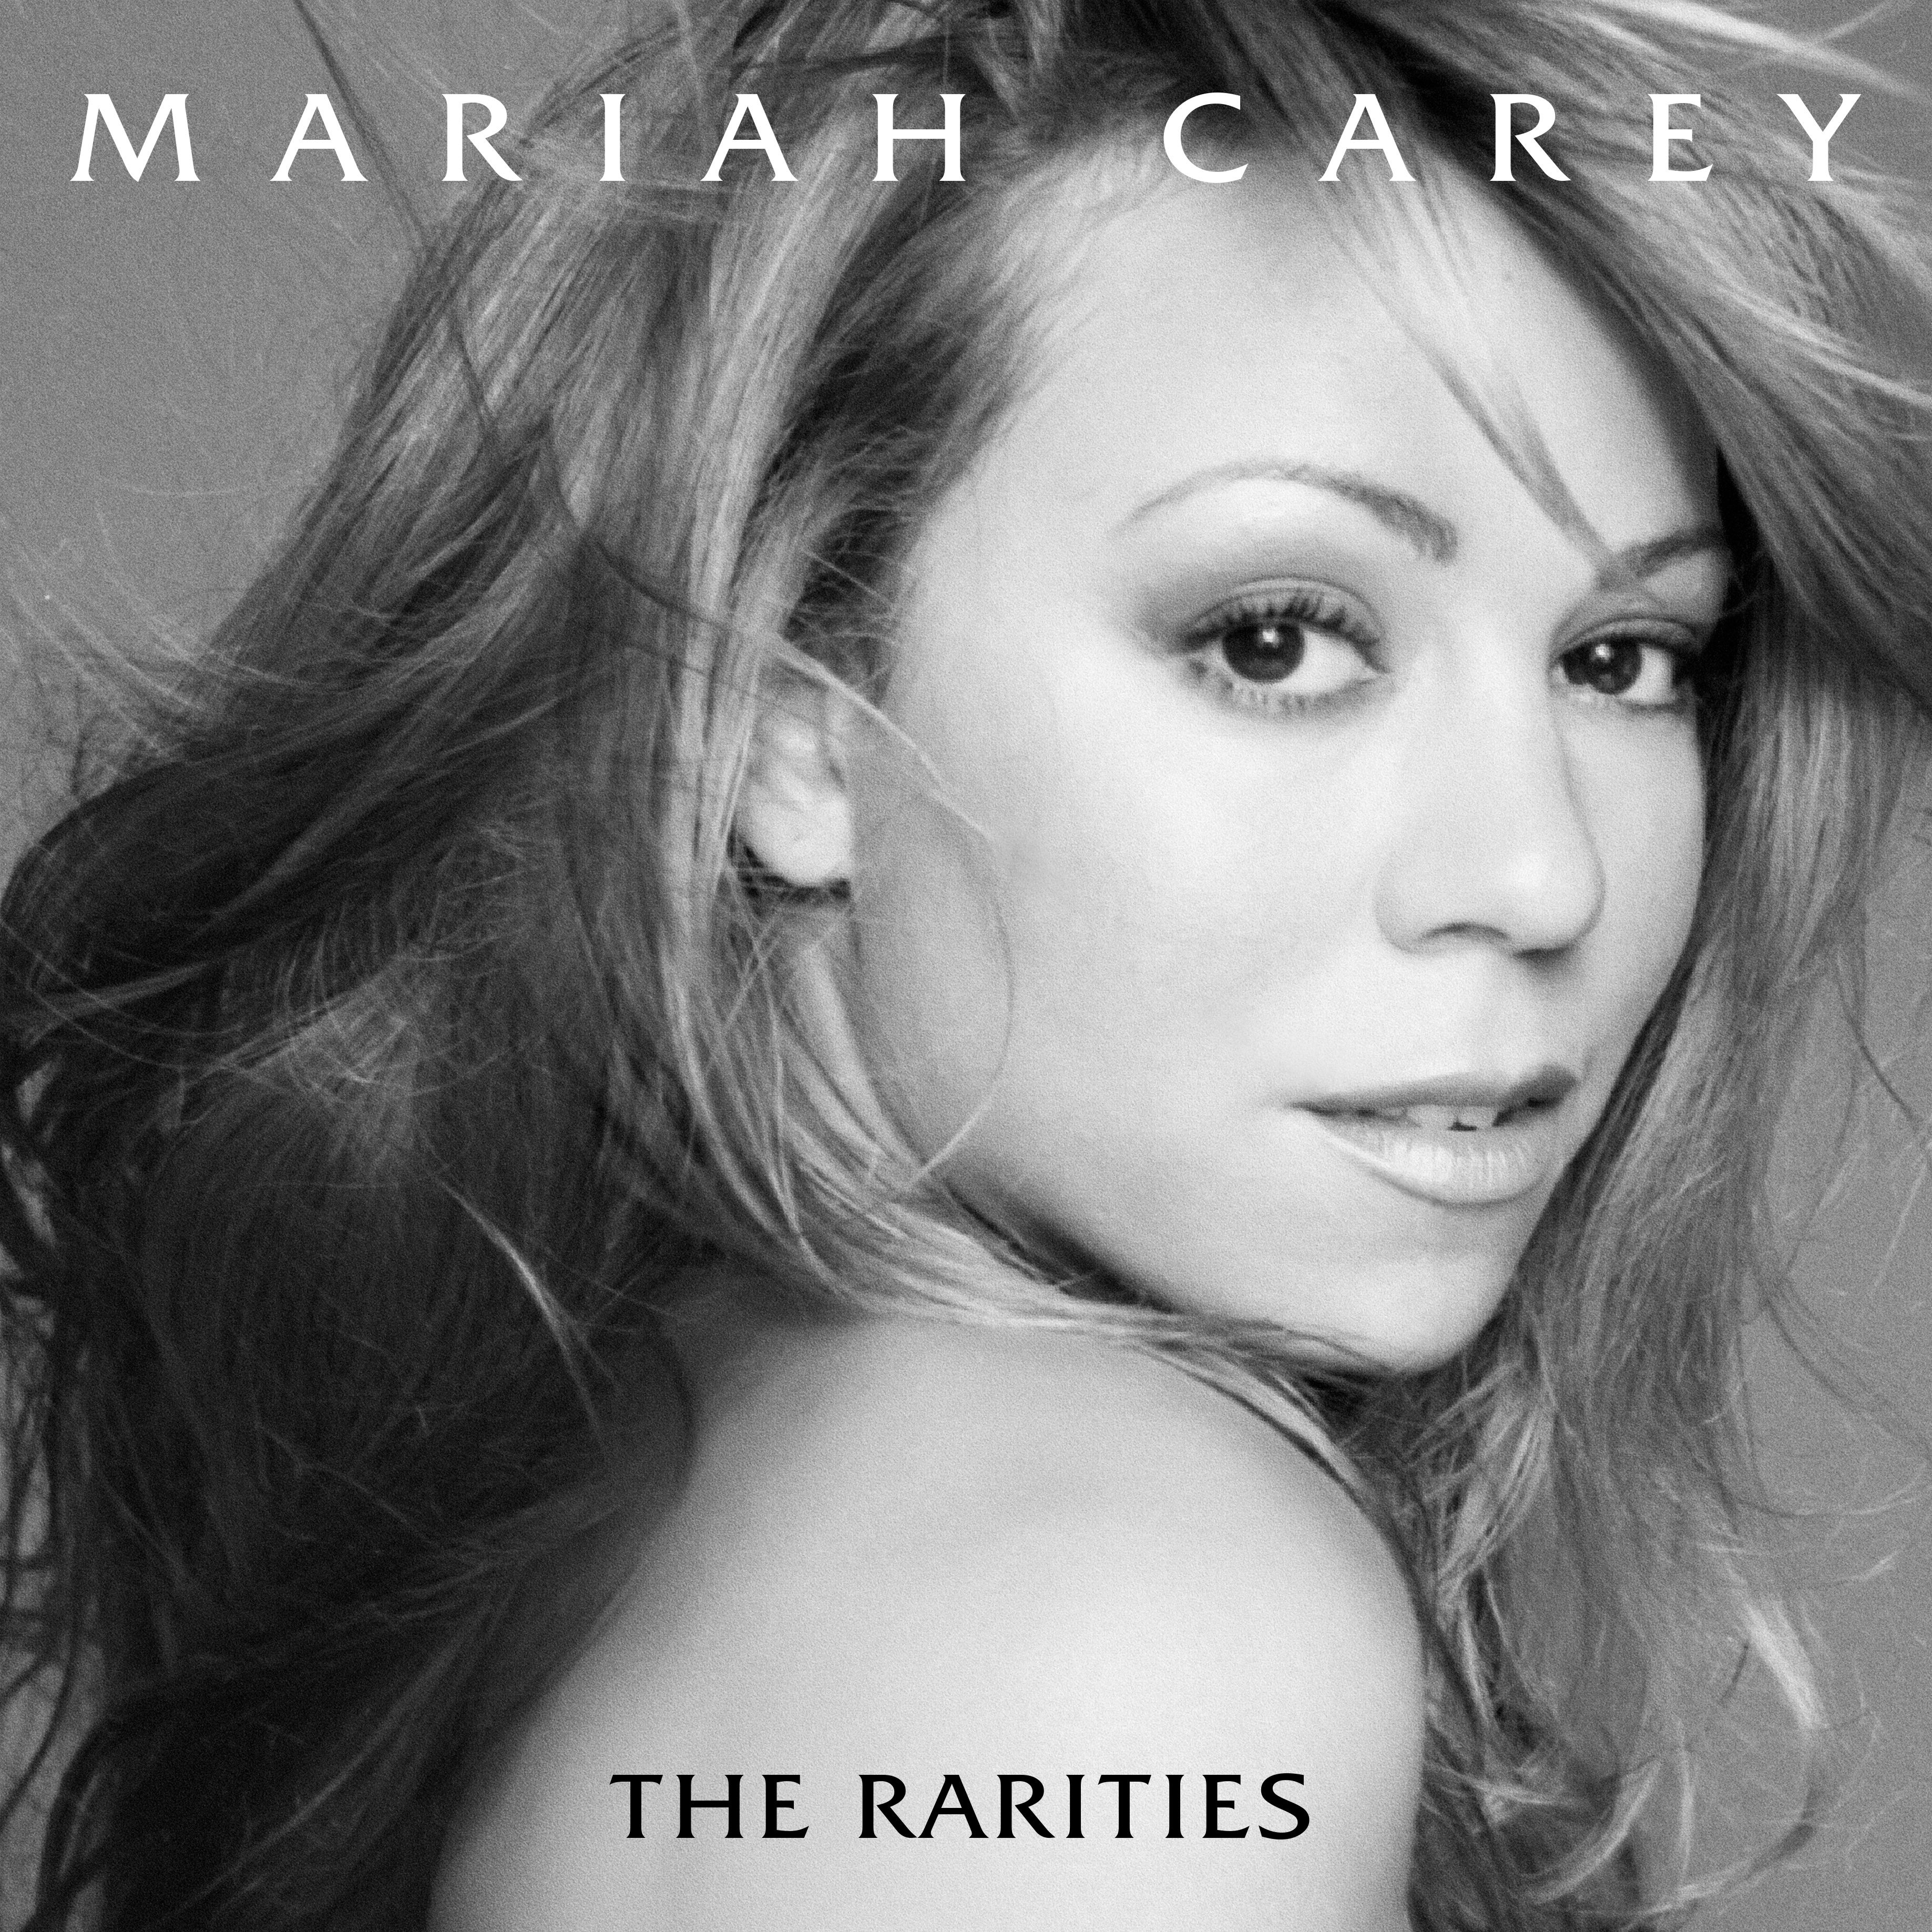 Mariah Carey - The Rarities album cover